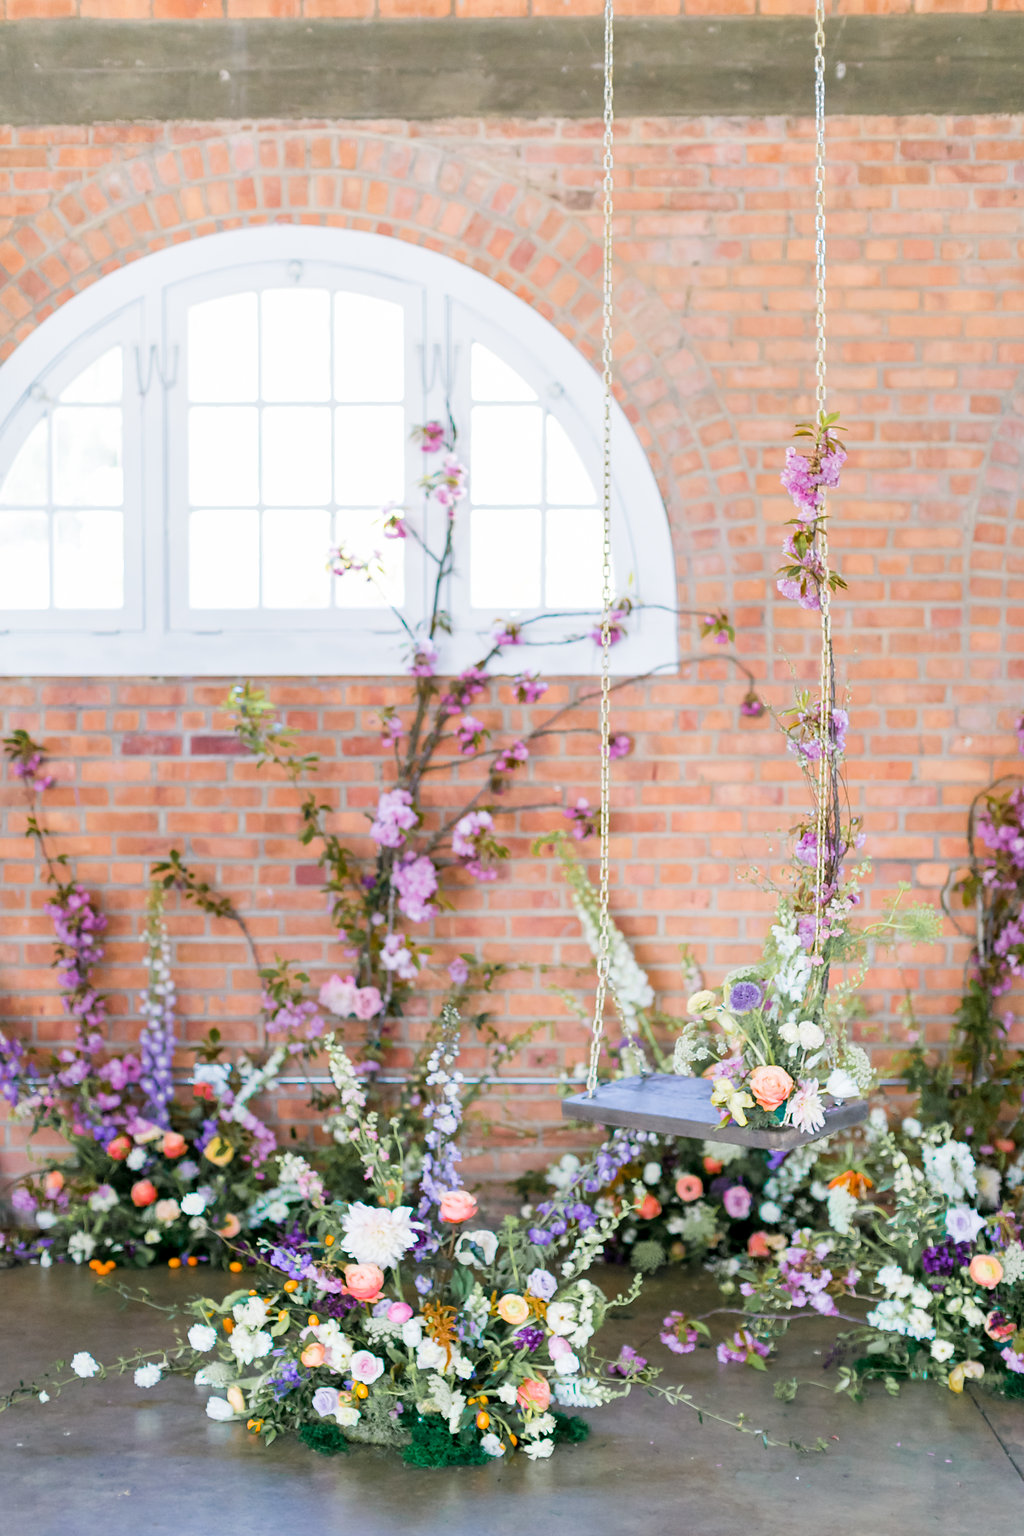 FloralBrickWeddingEditorial-NatalieSchuttPhotography-146 copy.JPG